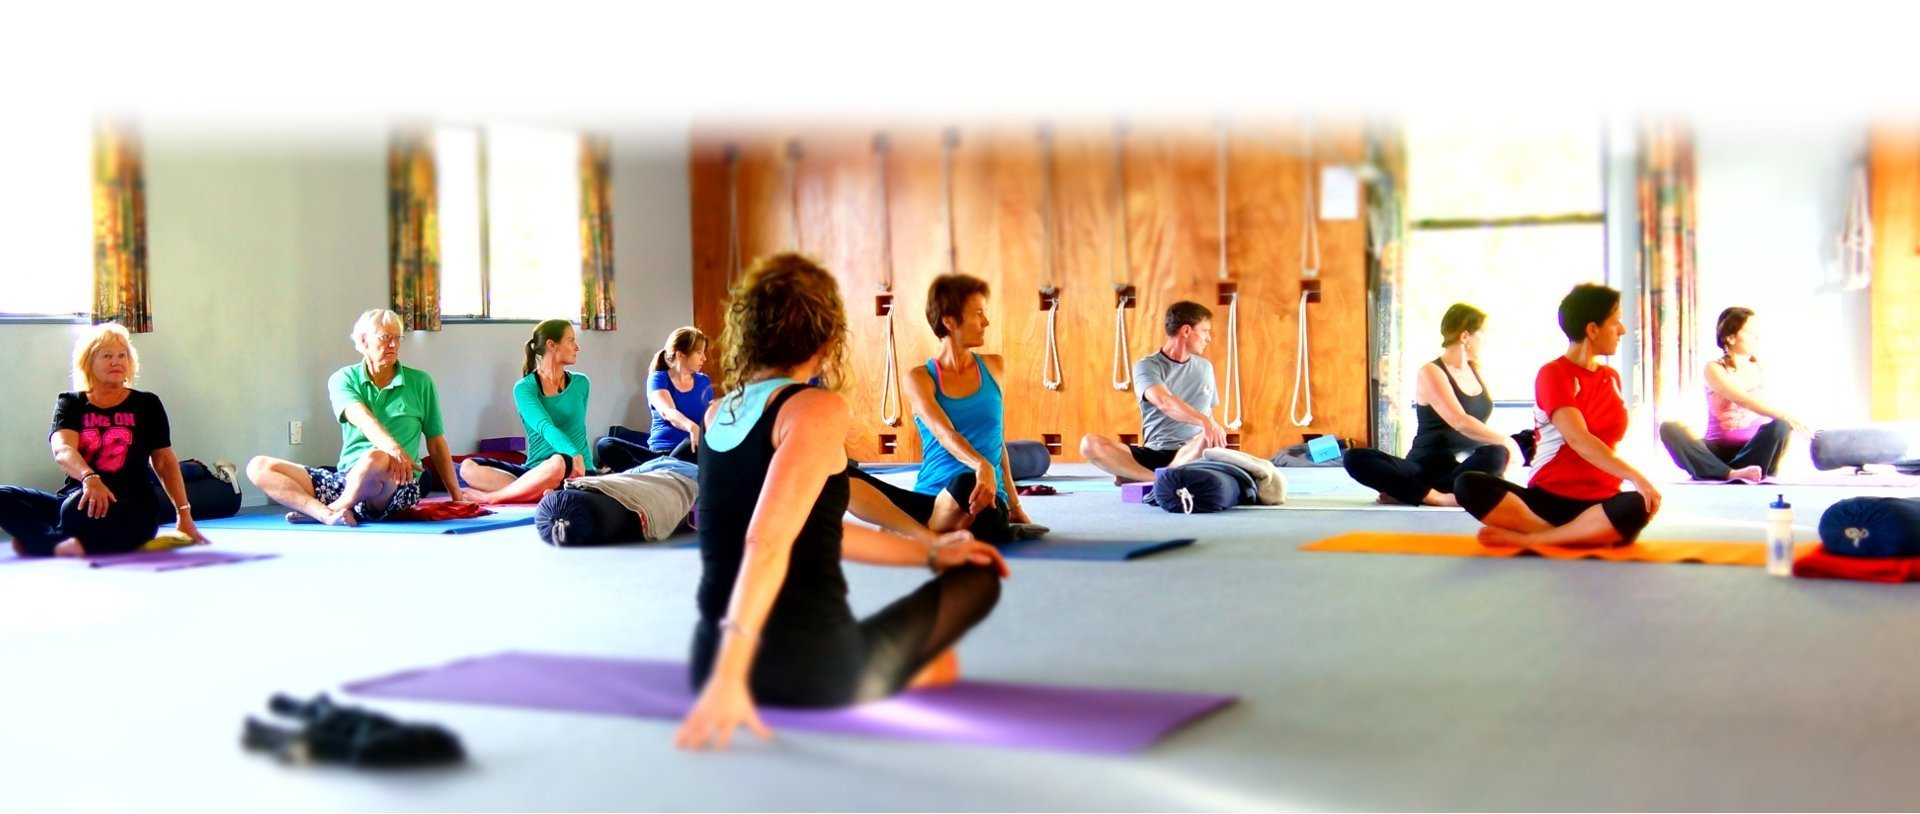 Affordable Non Profit Community Yoga